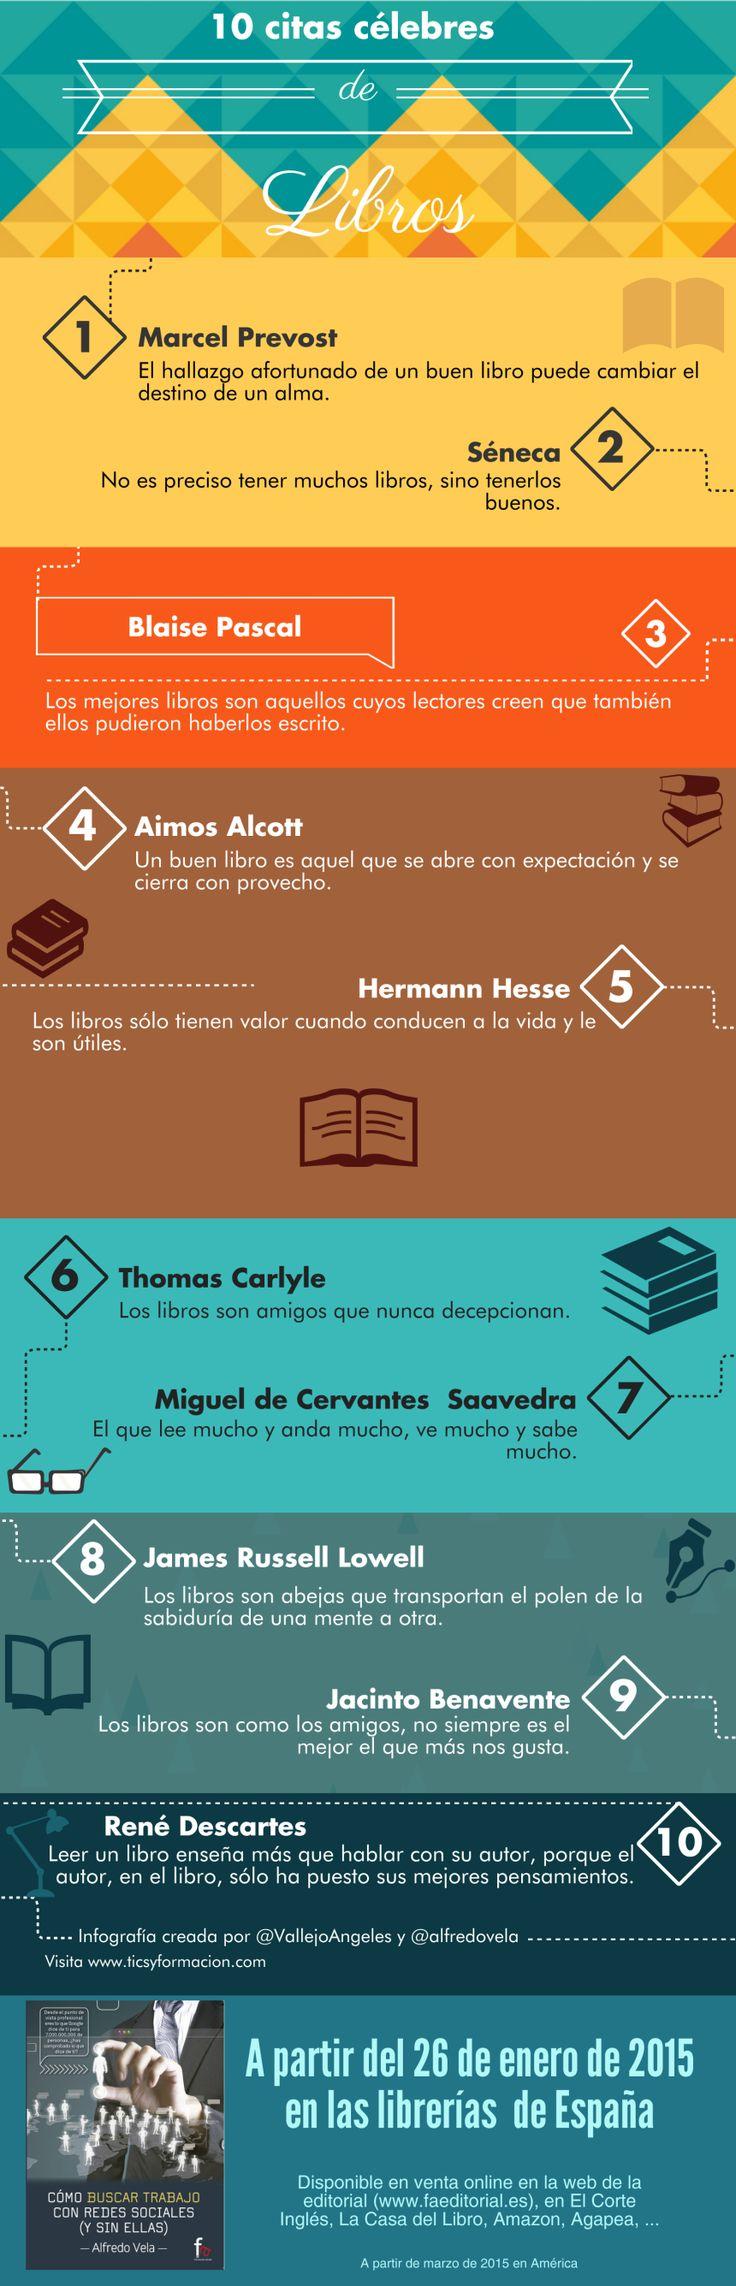 10 citas célebres sobre los libros #infografia #infographic #citas #quotes